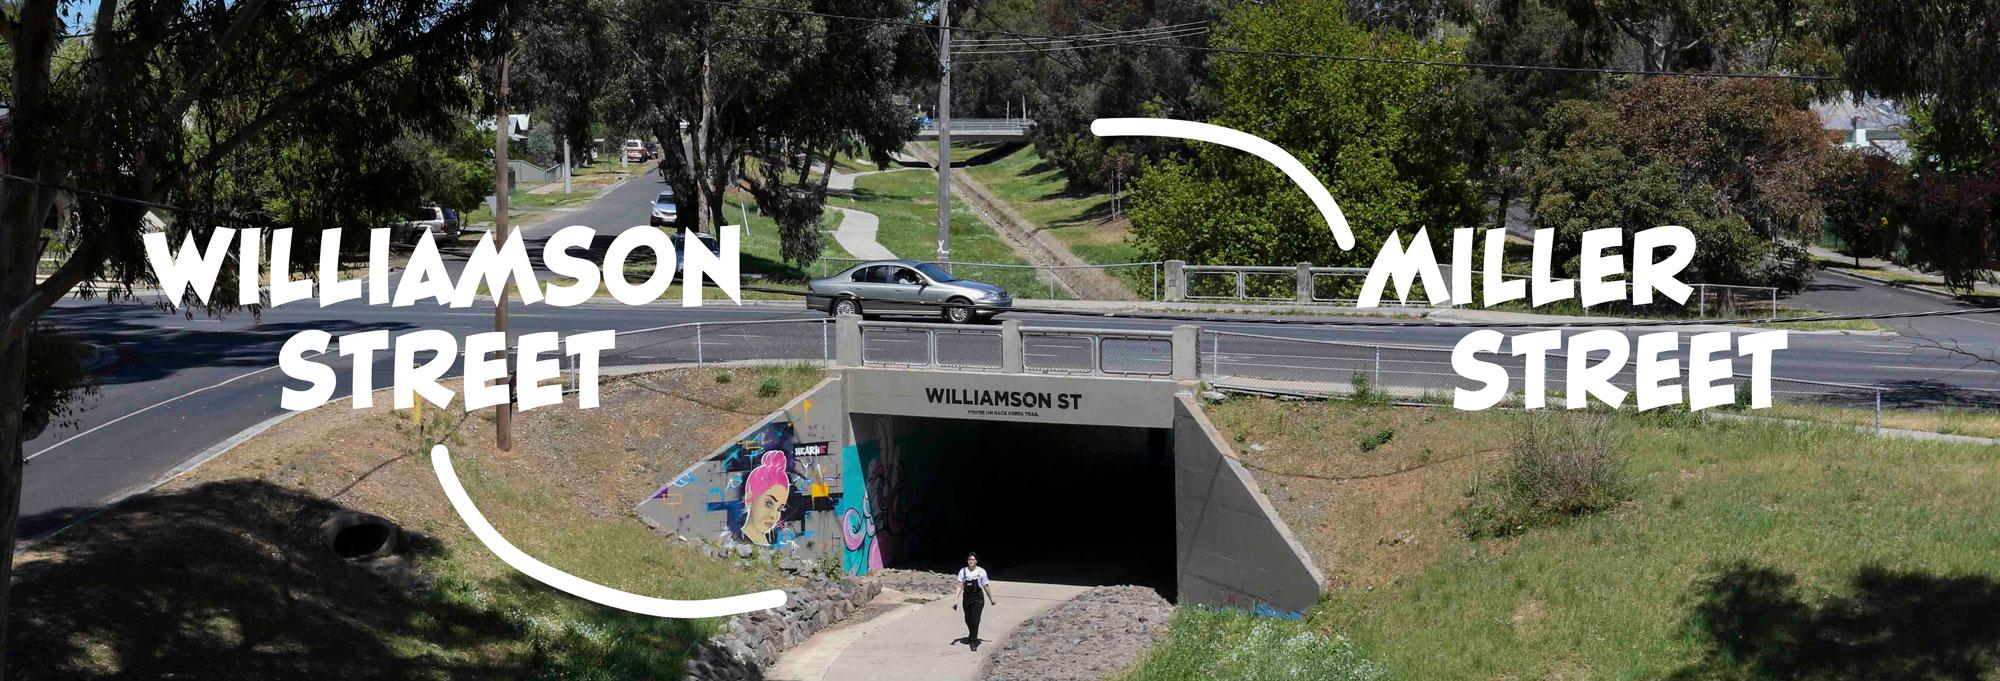 Williamson-Street-Miller-Street-bridge-bendigo-artist-ride.jpg